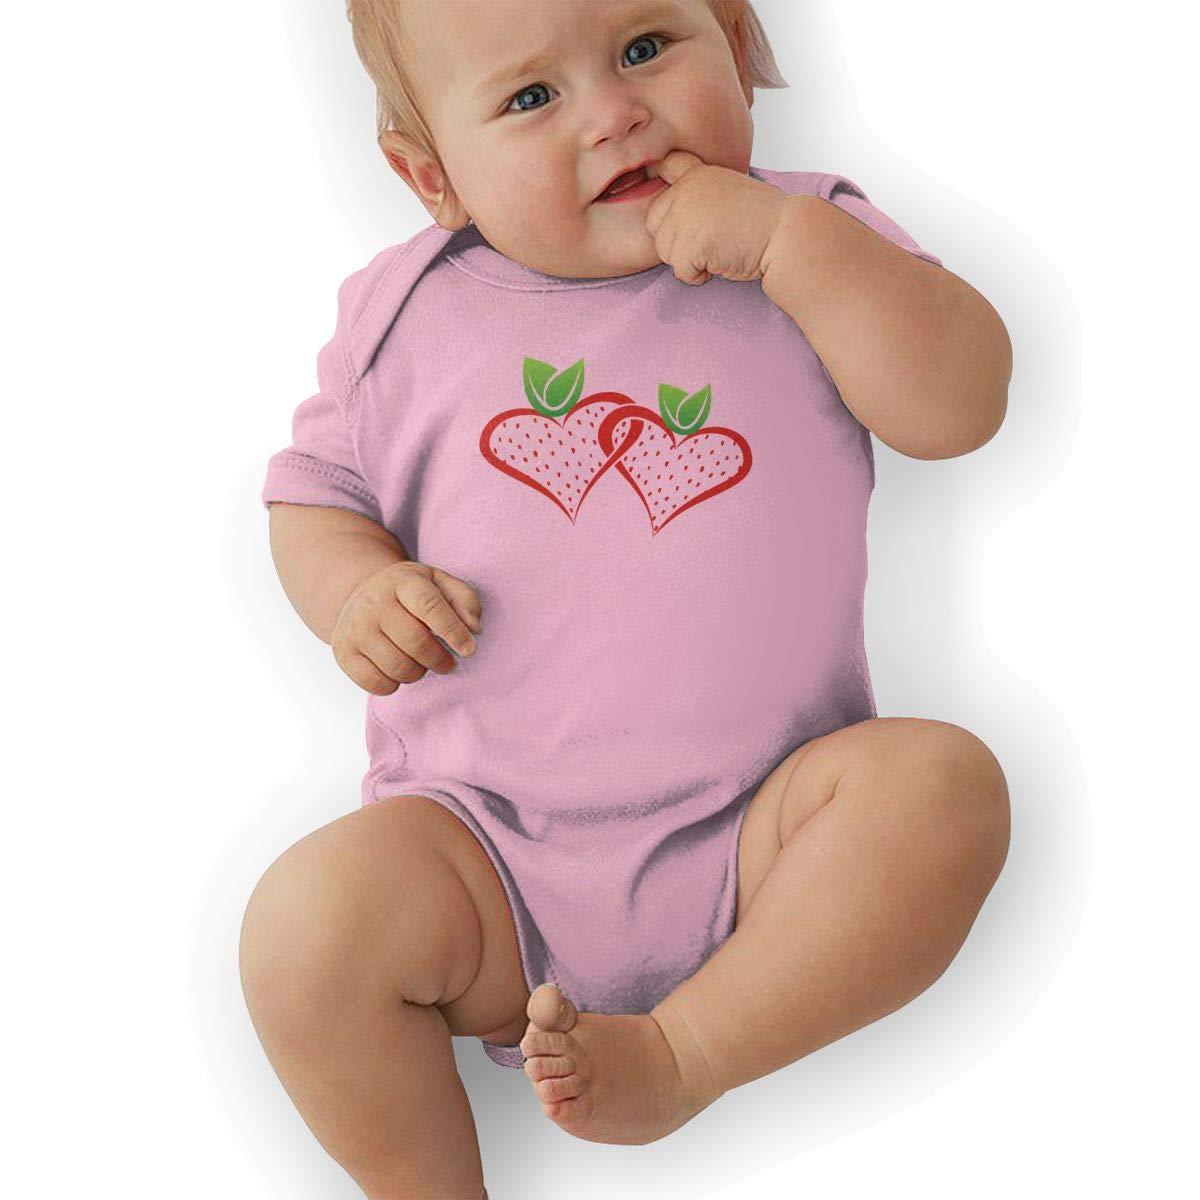 Infant Baby Boys Bodysuit Short-Sleeve Onesie Strawberry Print Rompers Autumn Pajamas